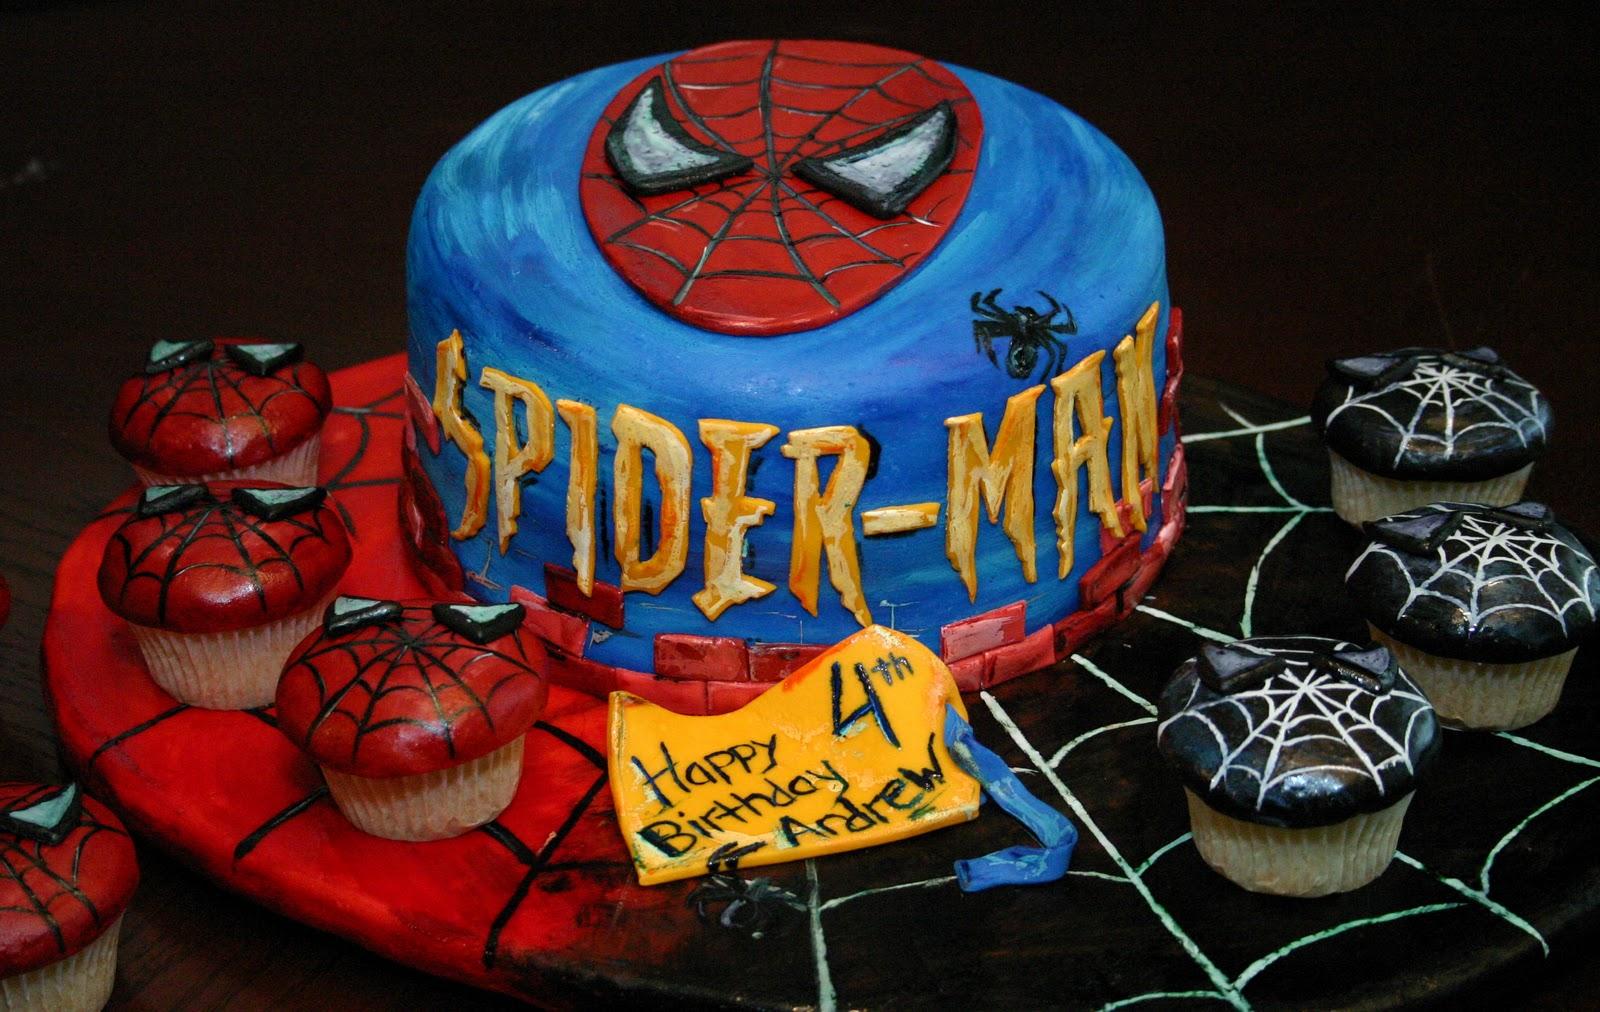 Stupendous Spiderman Cakes Decoration Ideas Little Birthday Cakes Funny Birthday Cards Online Unhofree Goldxyz